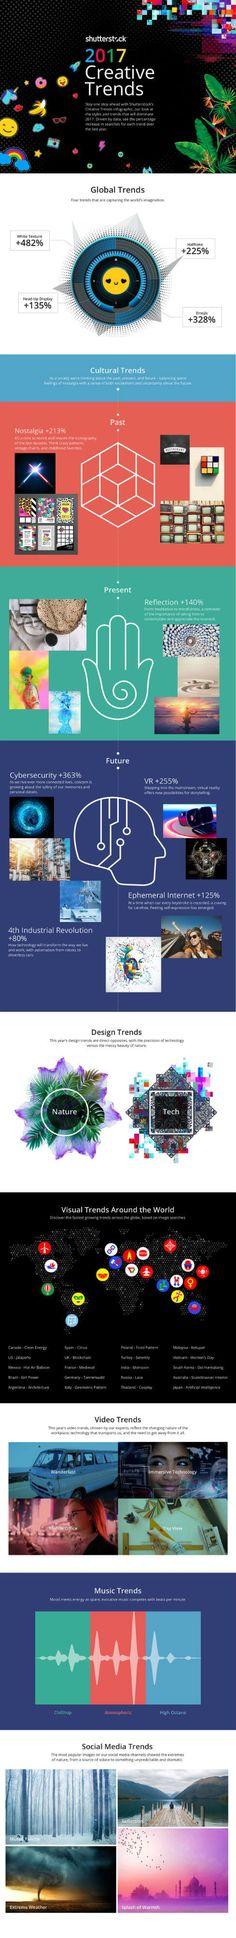 infografia tendencias creativas 2017